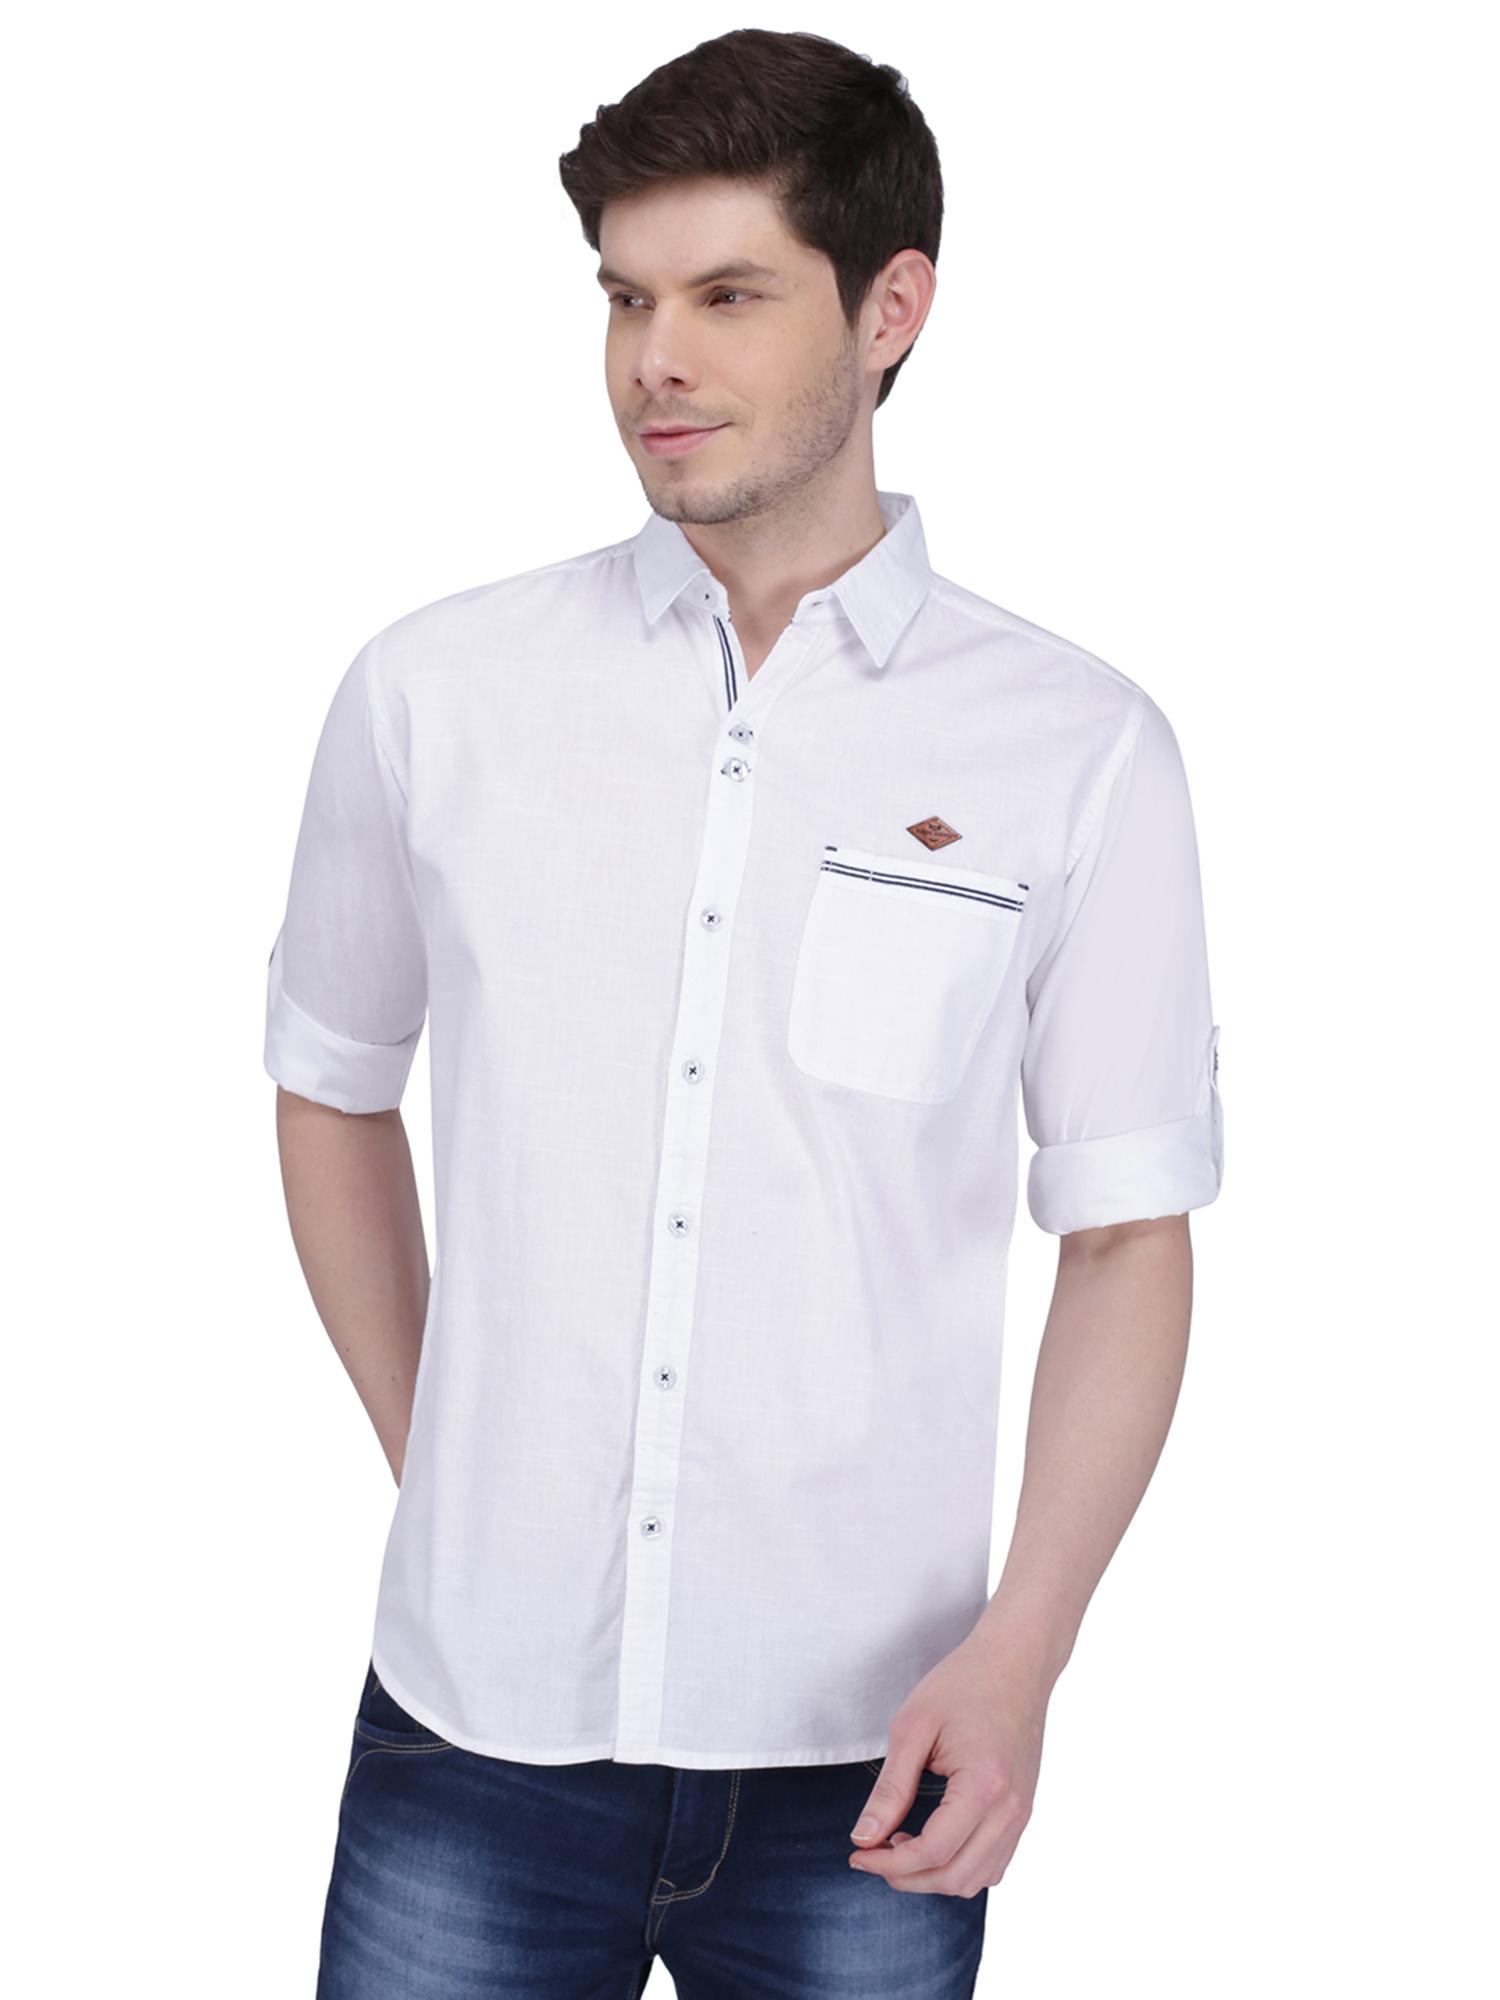 Kuons Avenue | Kuons Avenue Men's White Linen Cotton Shirt- KACLFS1309WH